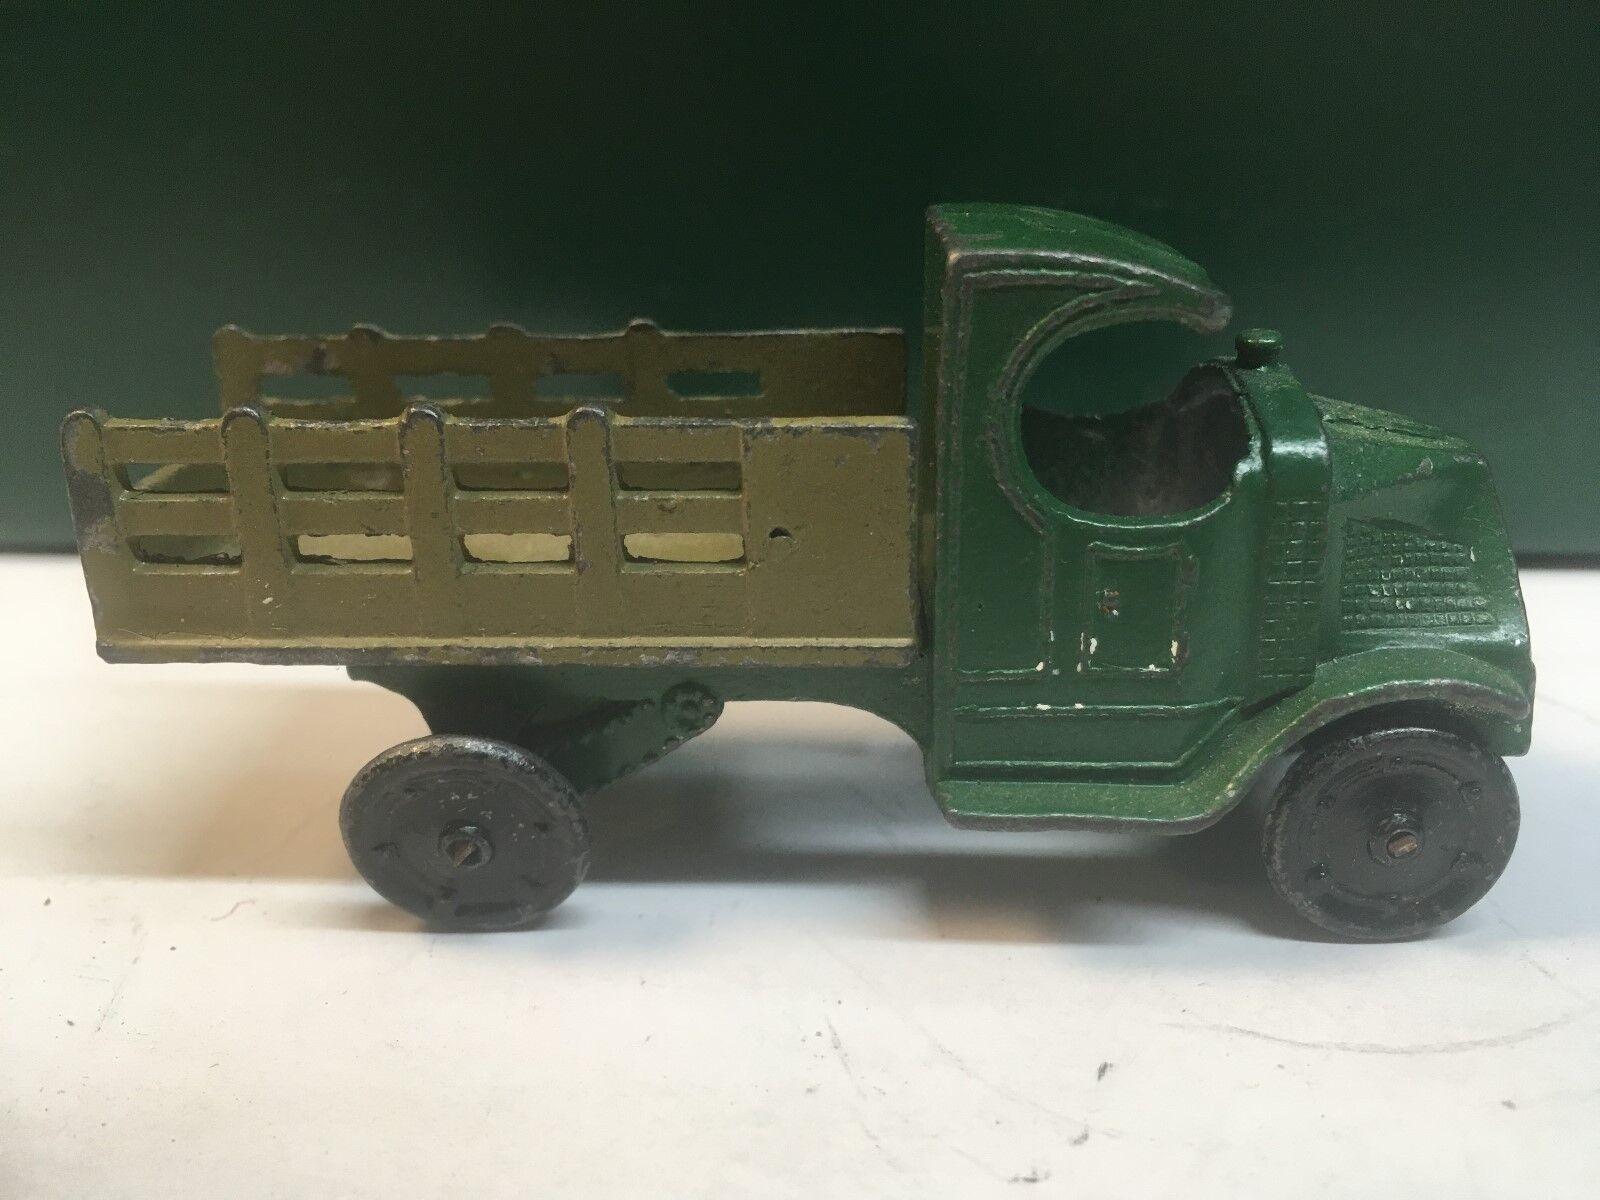 Tootsietoy Mack  C  Cab toy truck